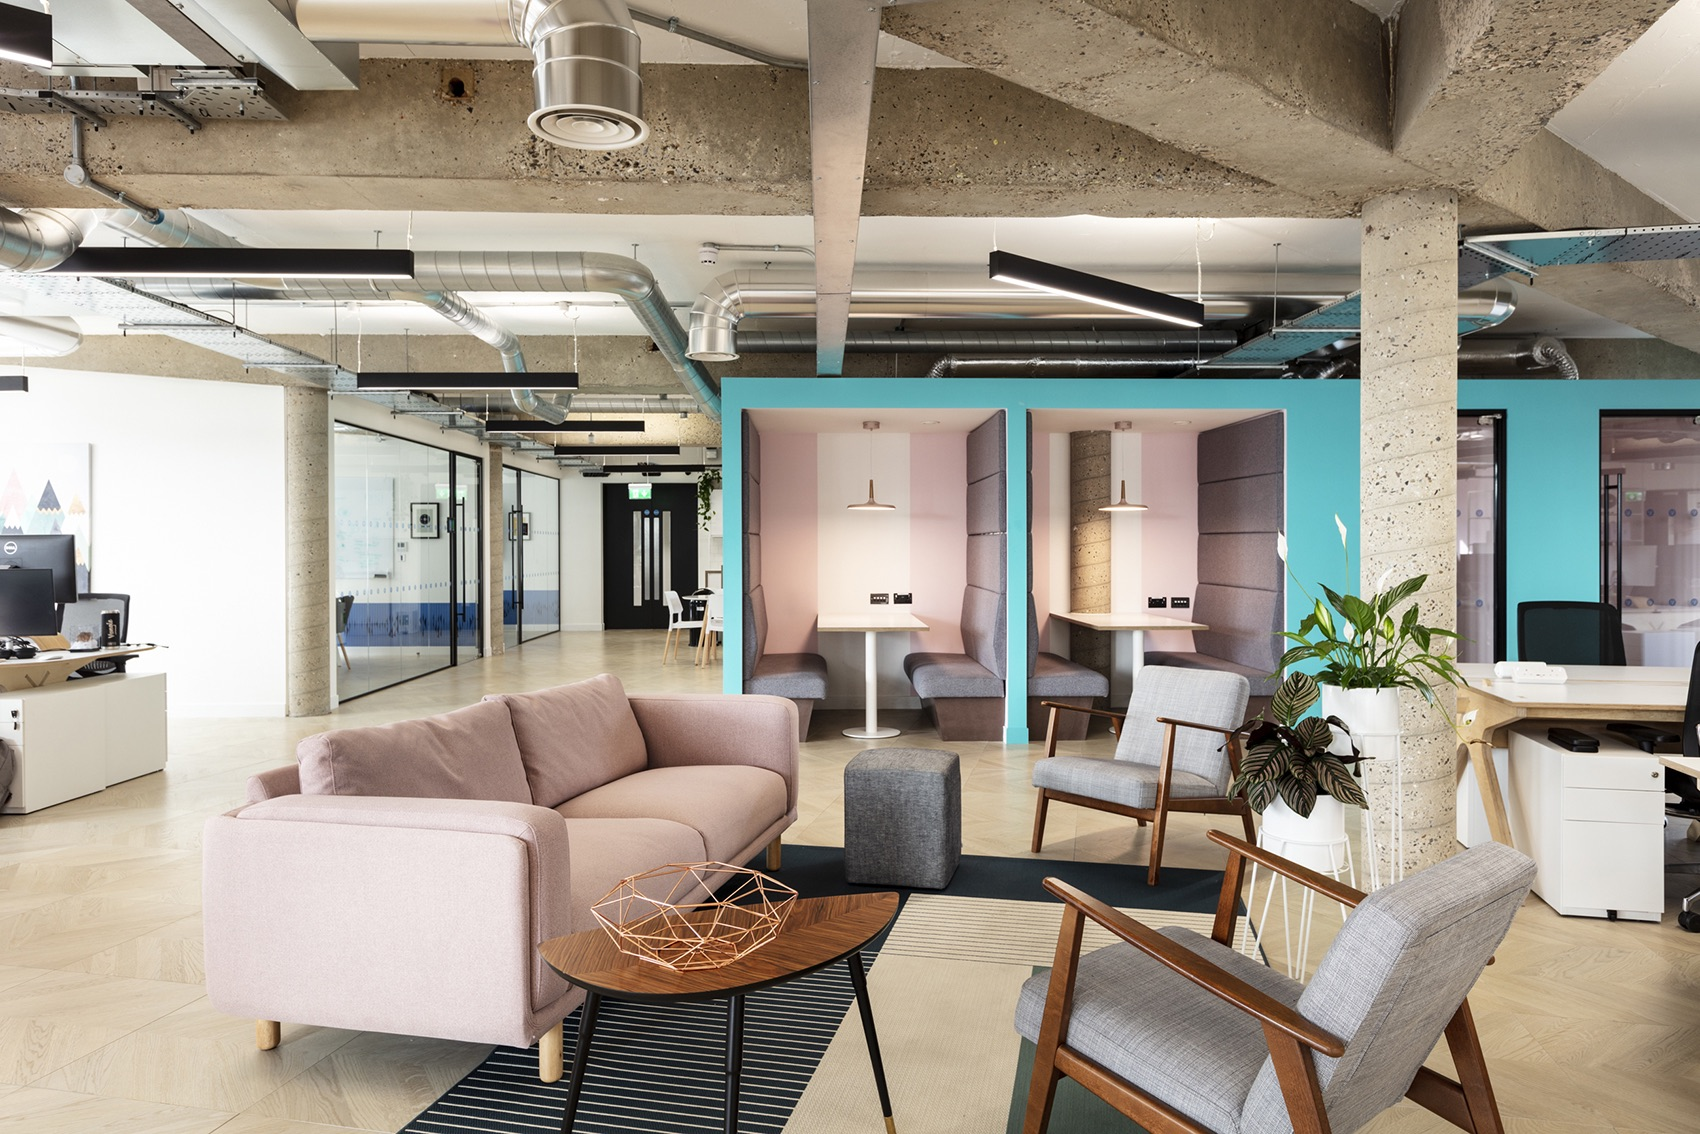 A Look Inside Vungle's Cool New London HQ